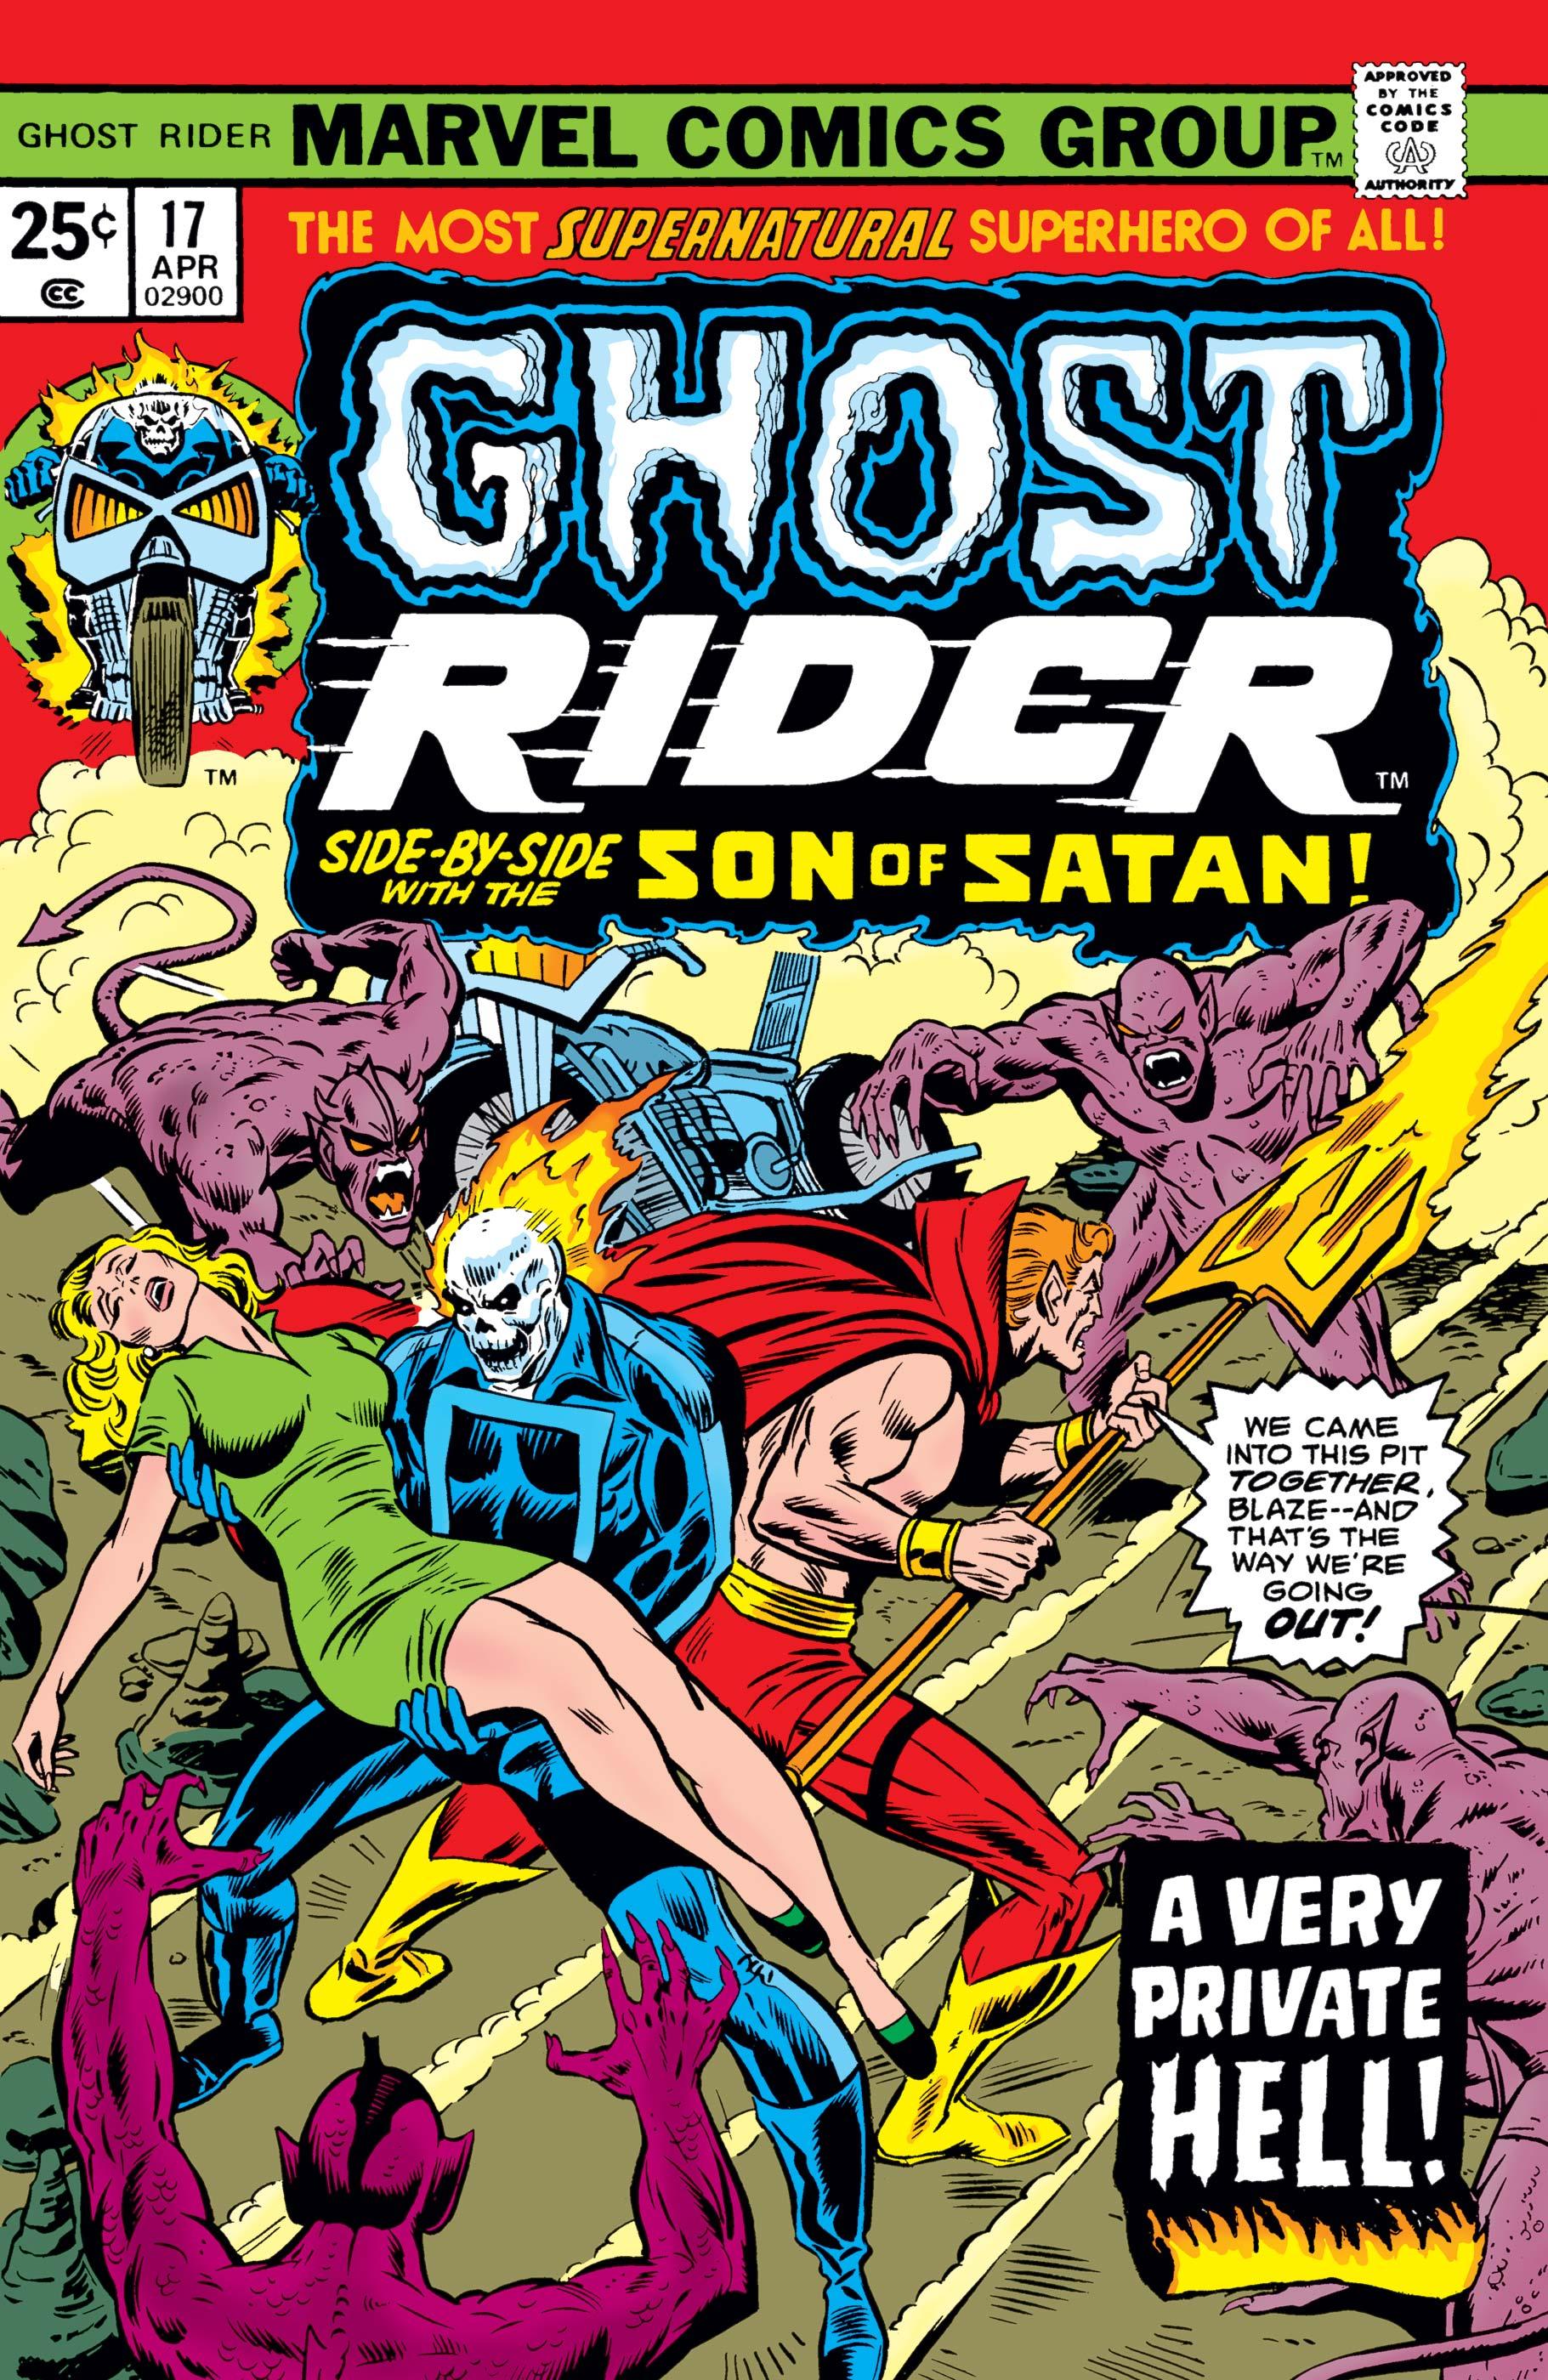 Ghost Rider (1973) #17